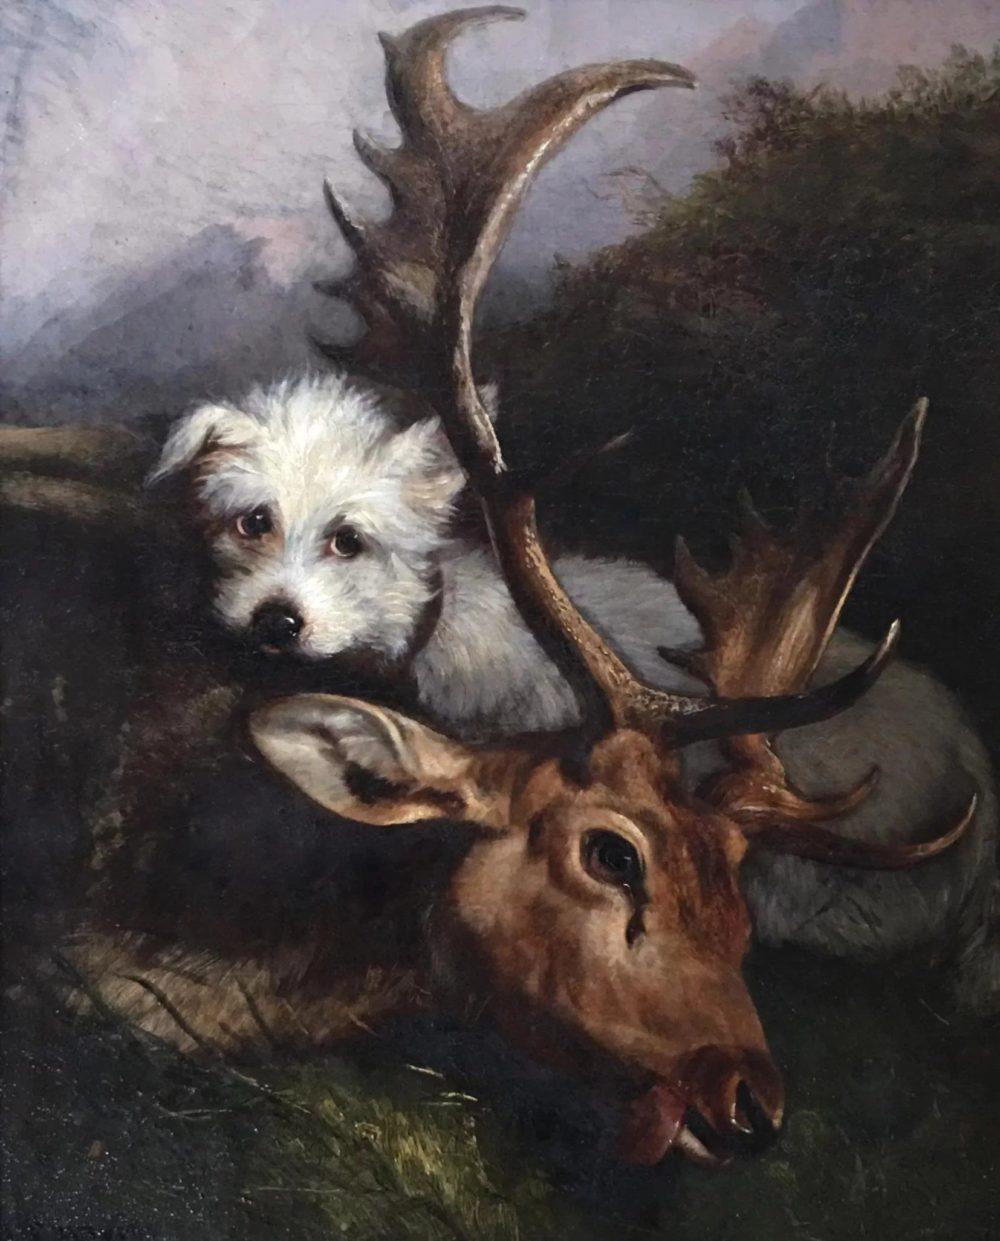 Antique-oil-canvas-hunting-scene-dog-full-4-2048x2-951